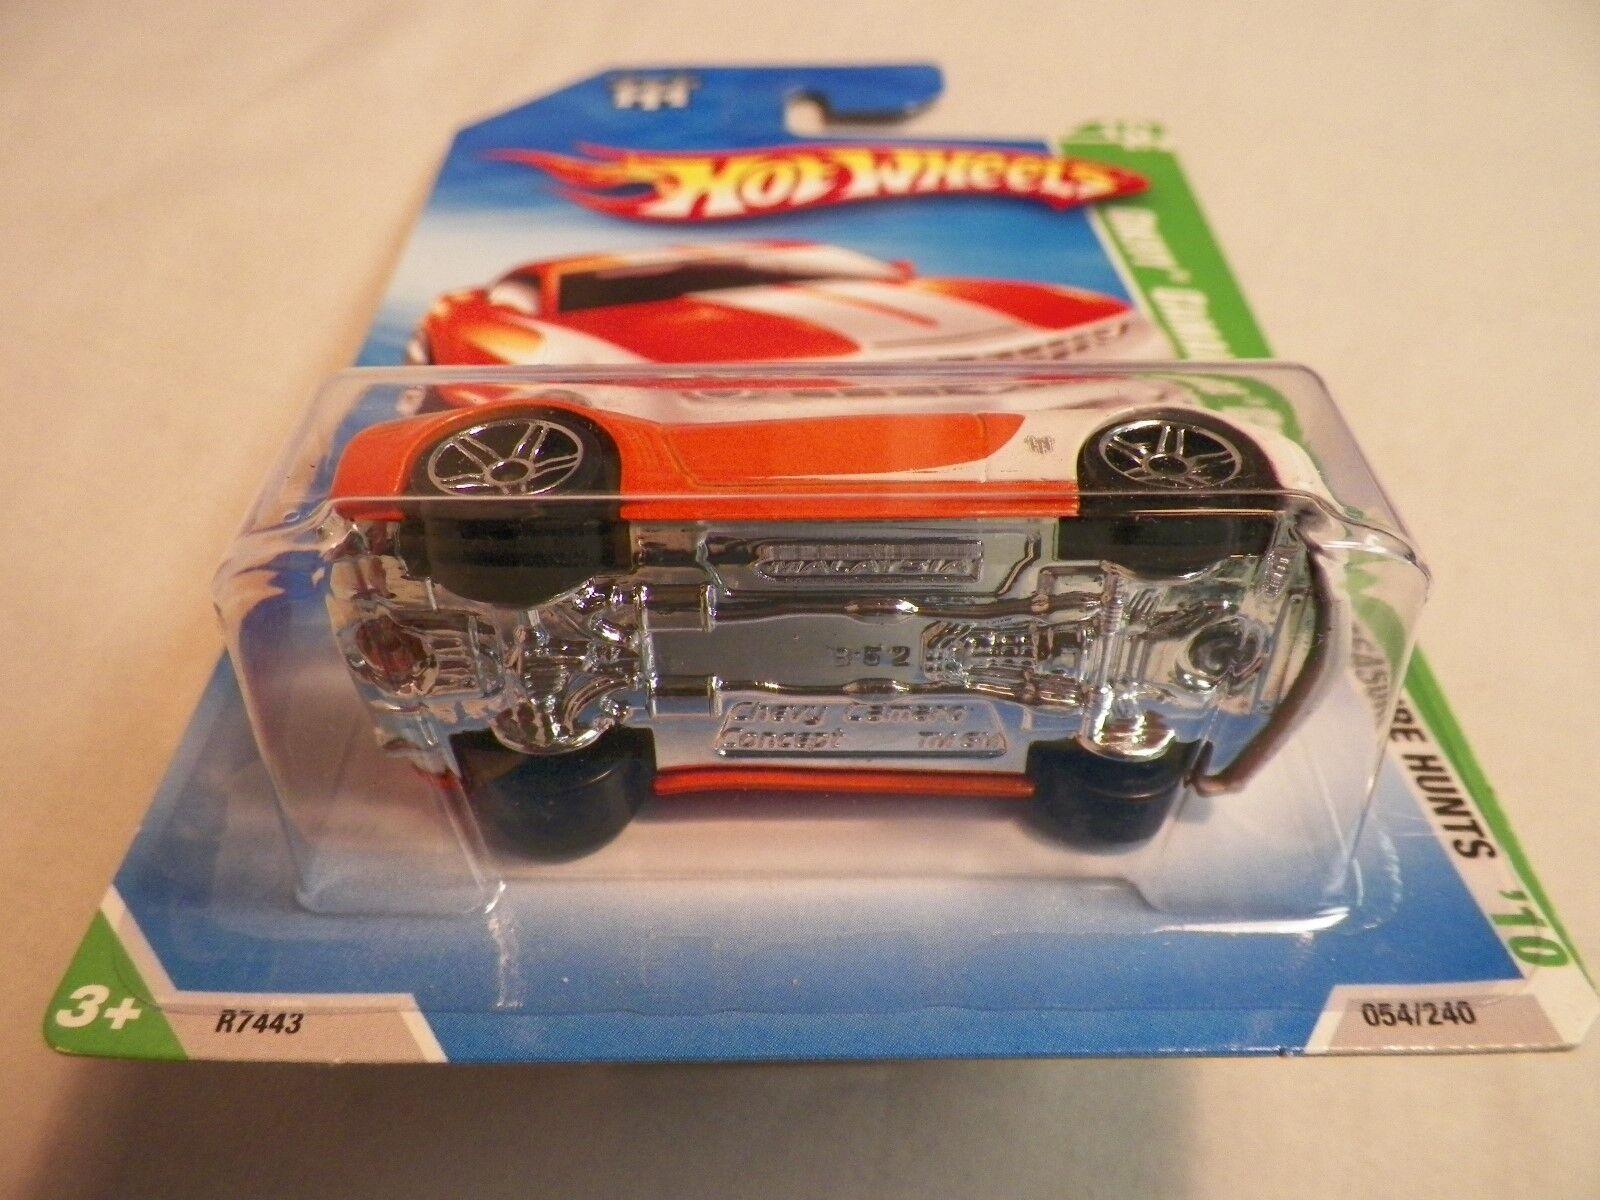 2010 Hot Wheels Wheels Wheels Chevy Camaro Concept Treasure Hunts Car 26b376